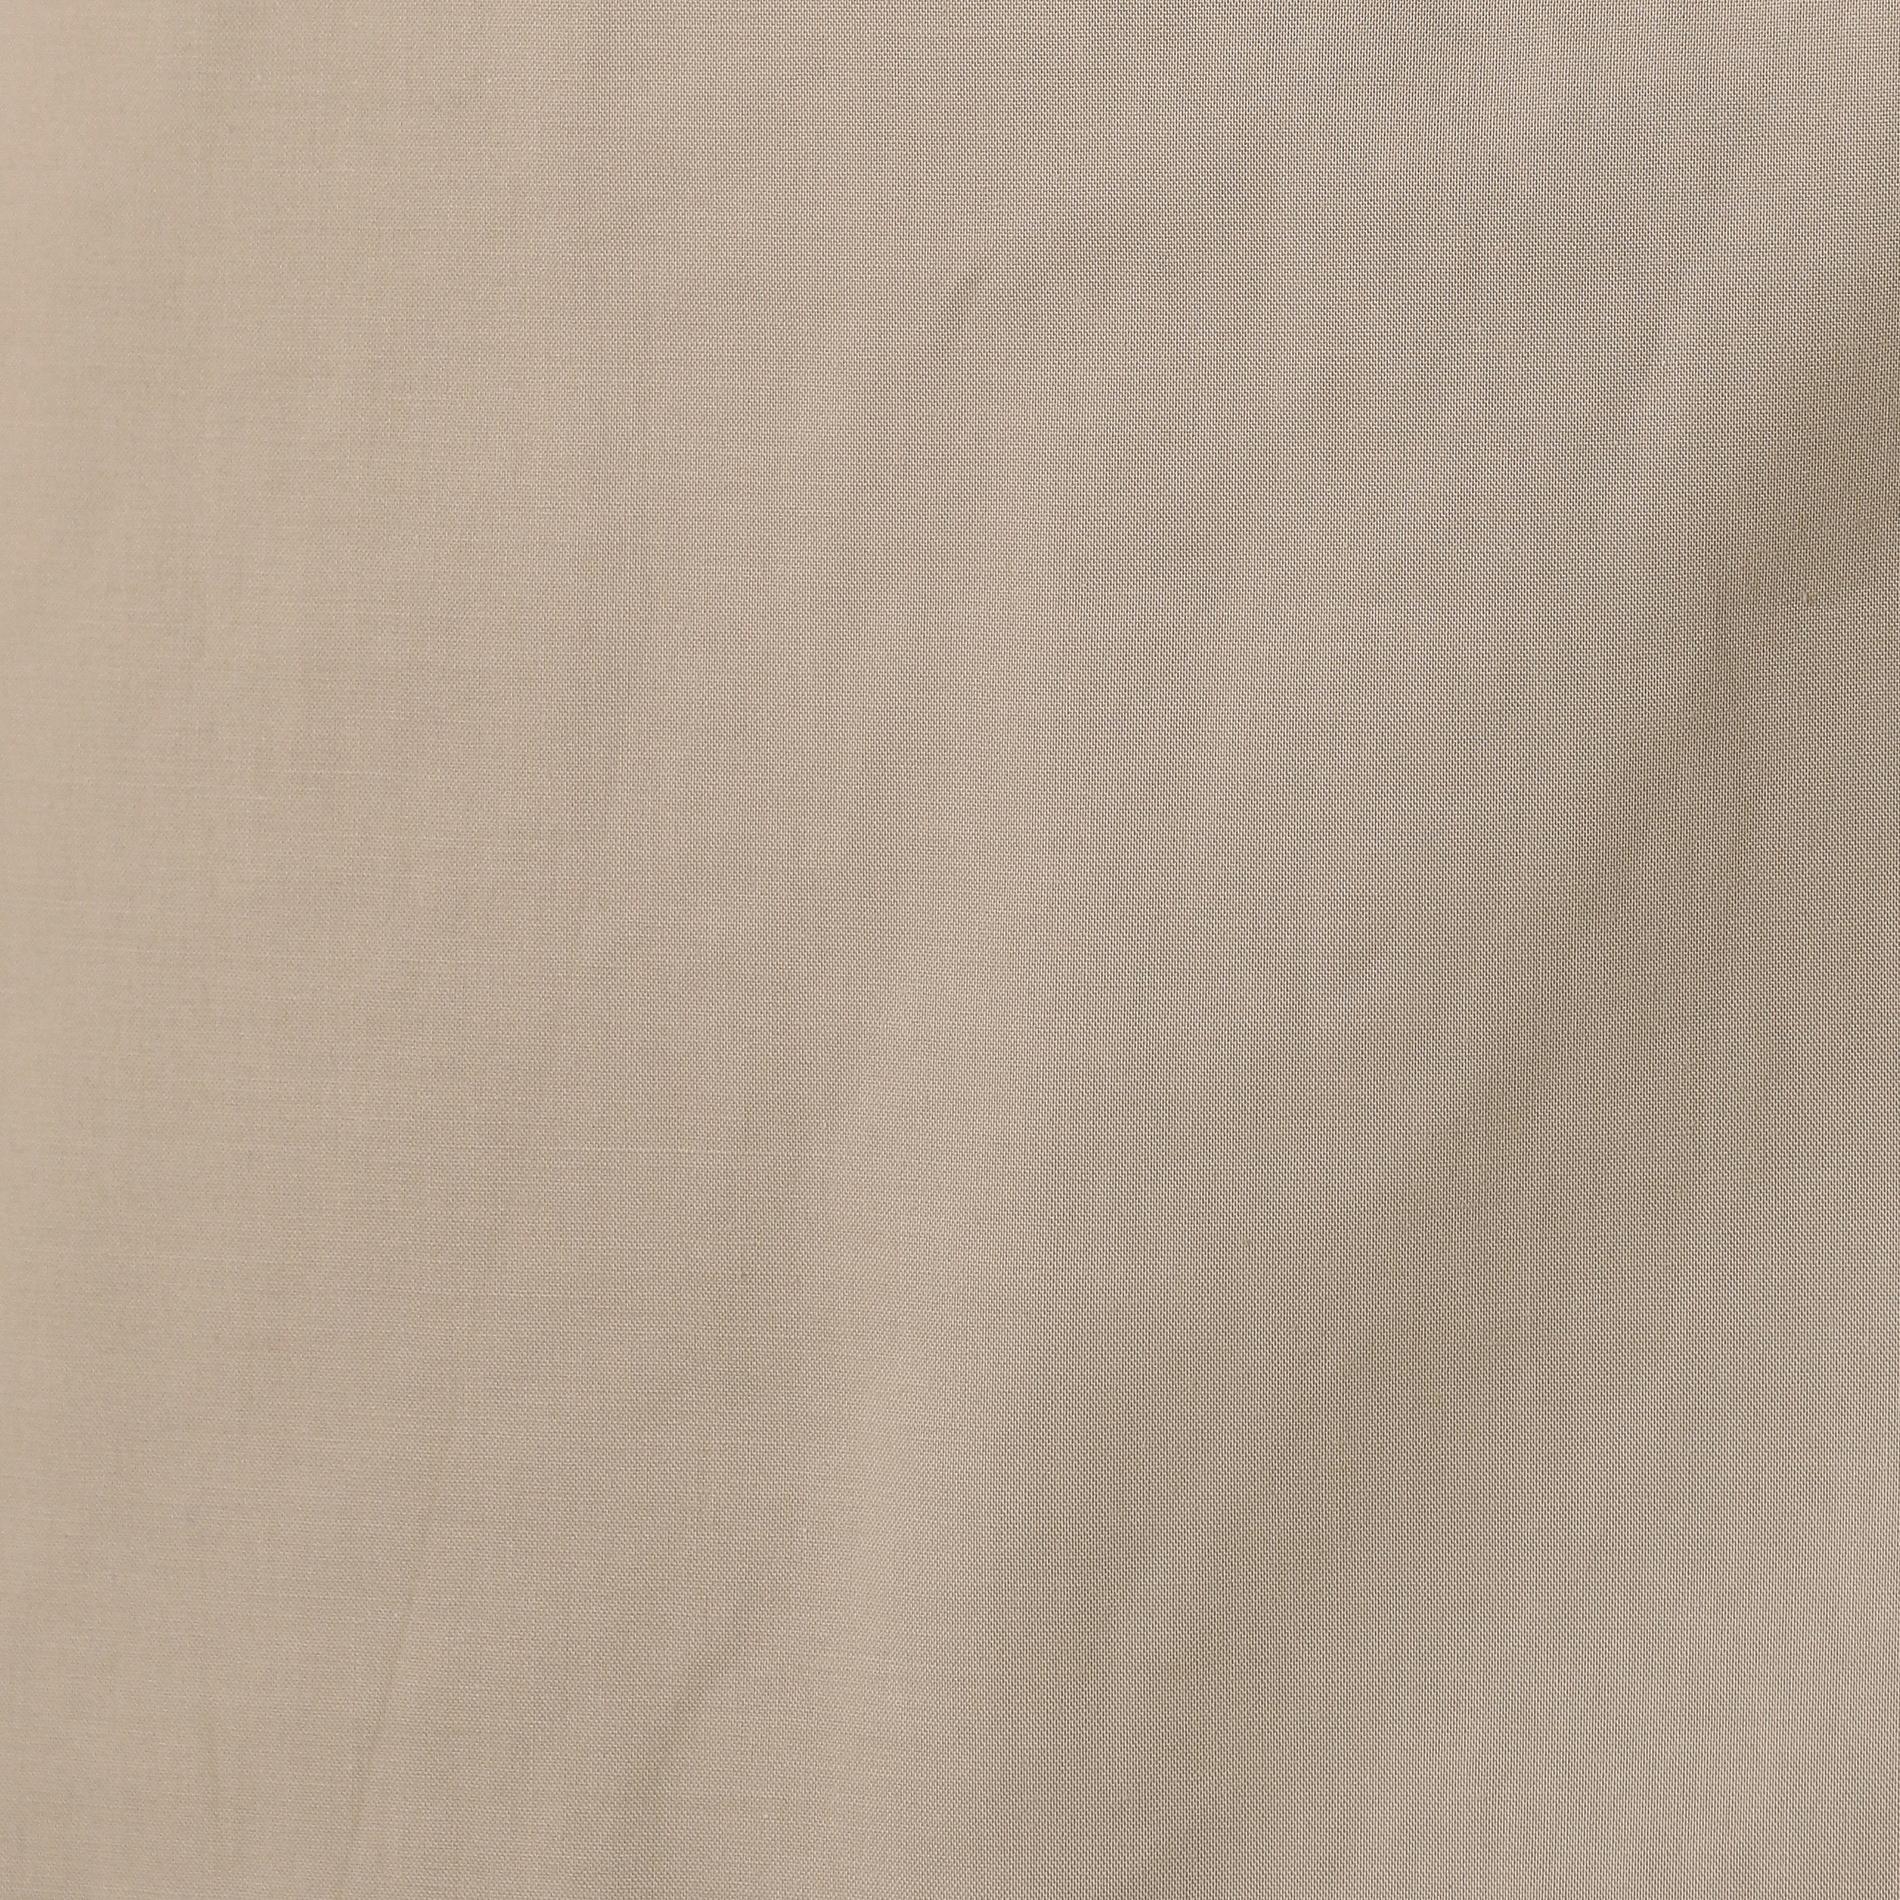 【MACKINTOSH】【BLAIRMORE】シングルトレンチコート